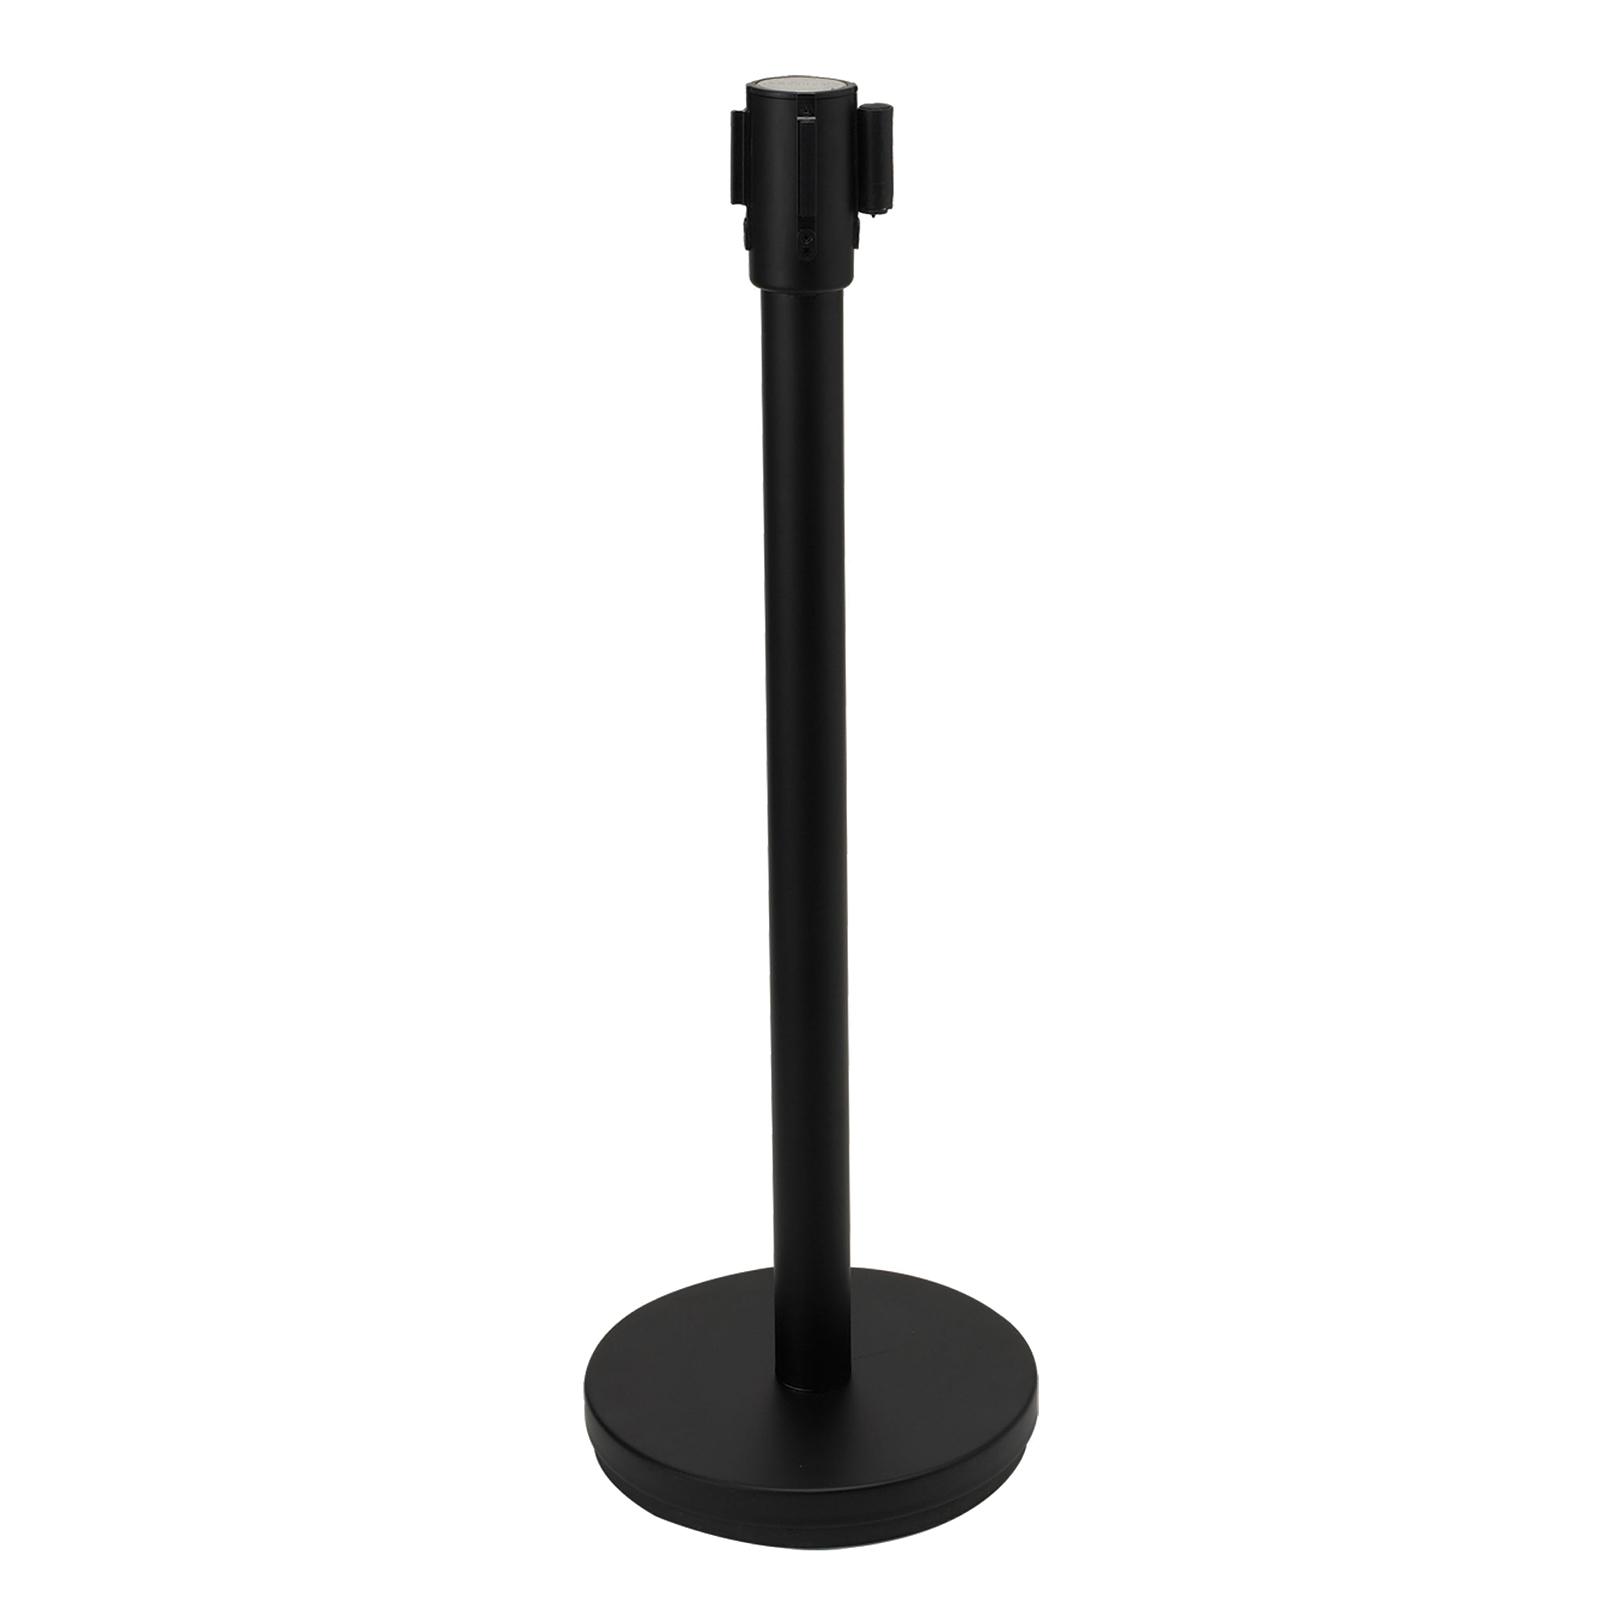 Black Retractable Belt Crowd Guidance System, Winco CGS-38K